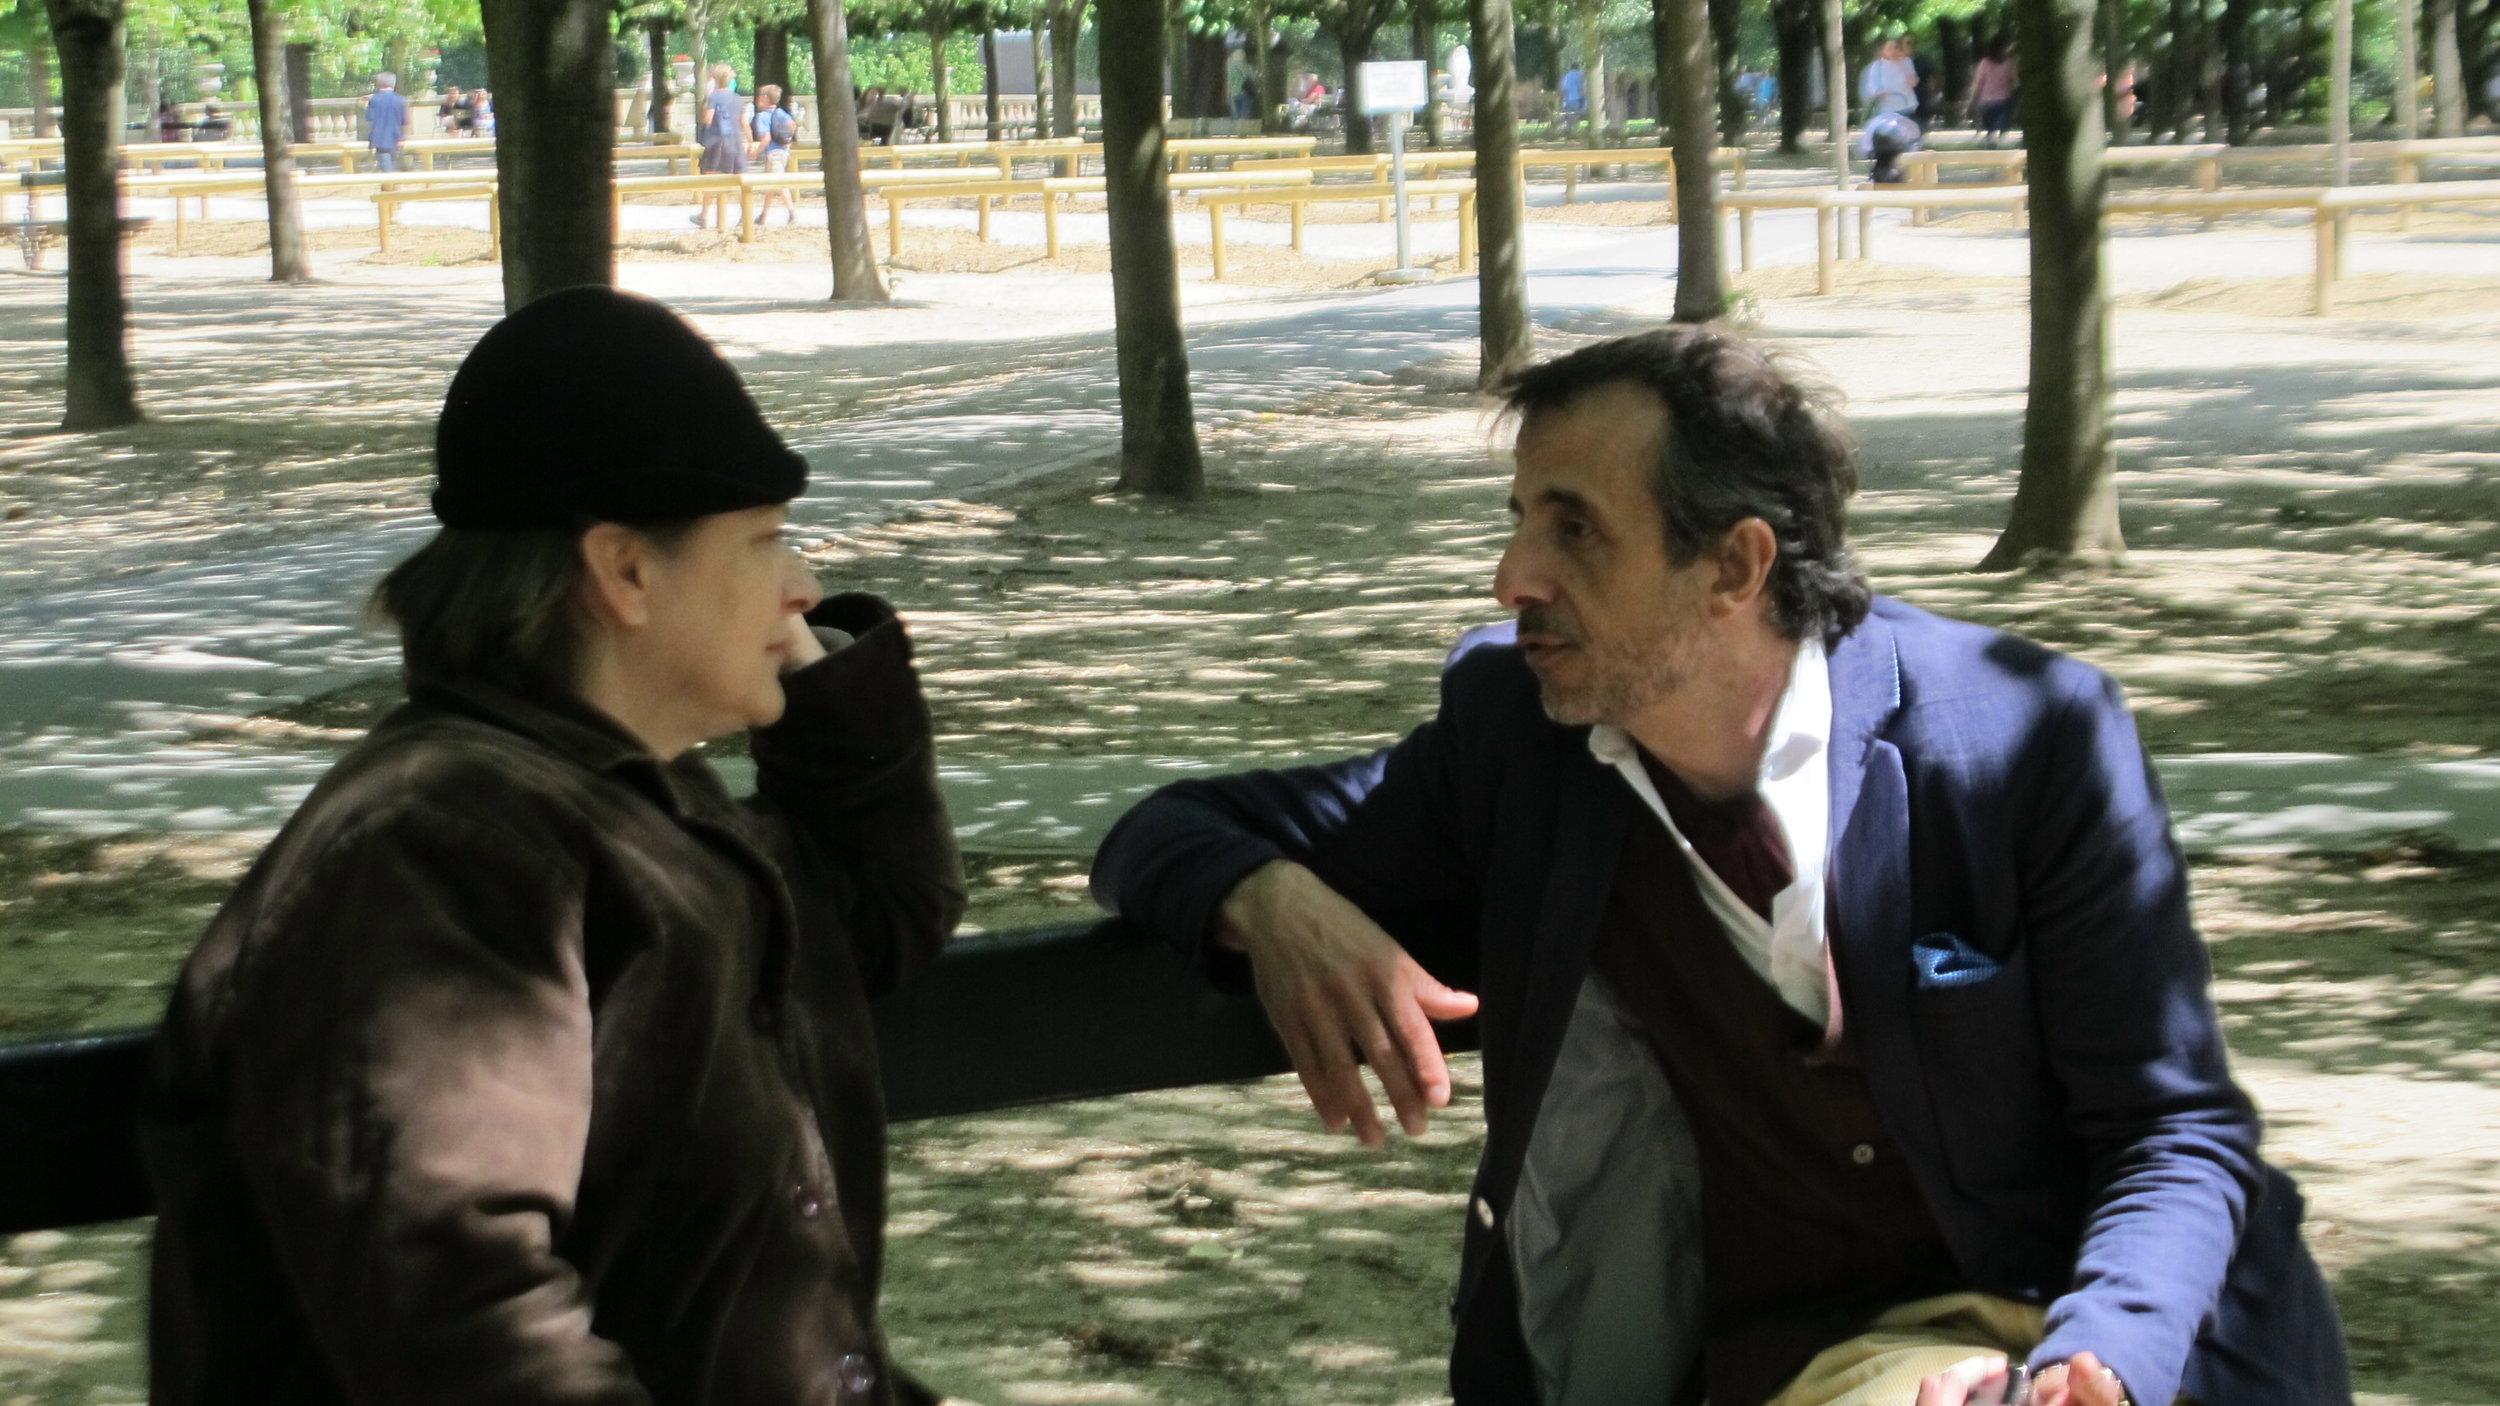 Gertrude Stein and Ernest Hemingway debating literature in the Luxembourg Gardens, Paris.